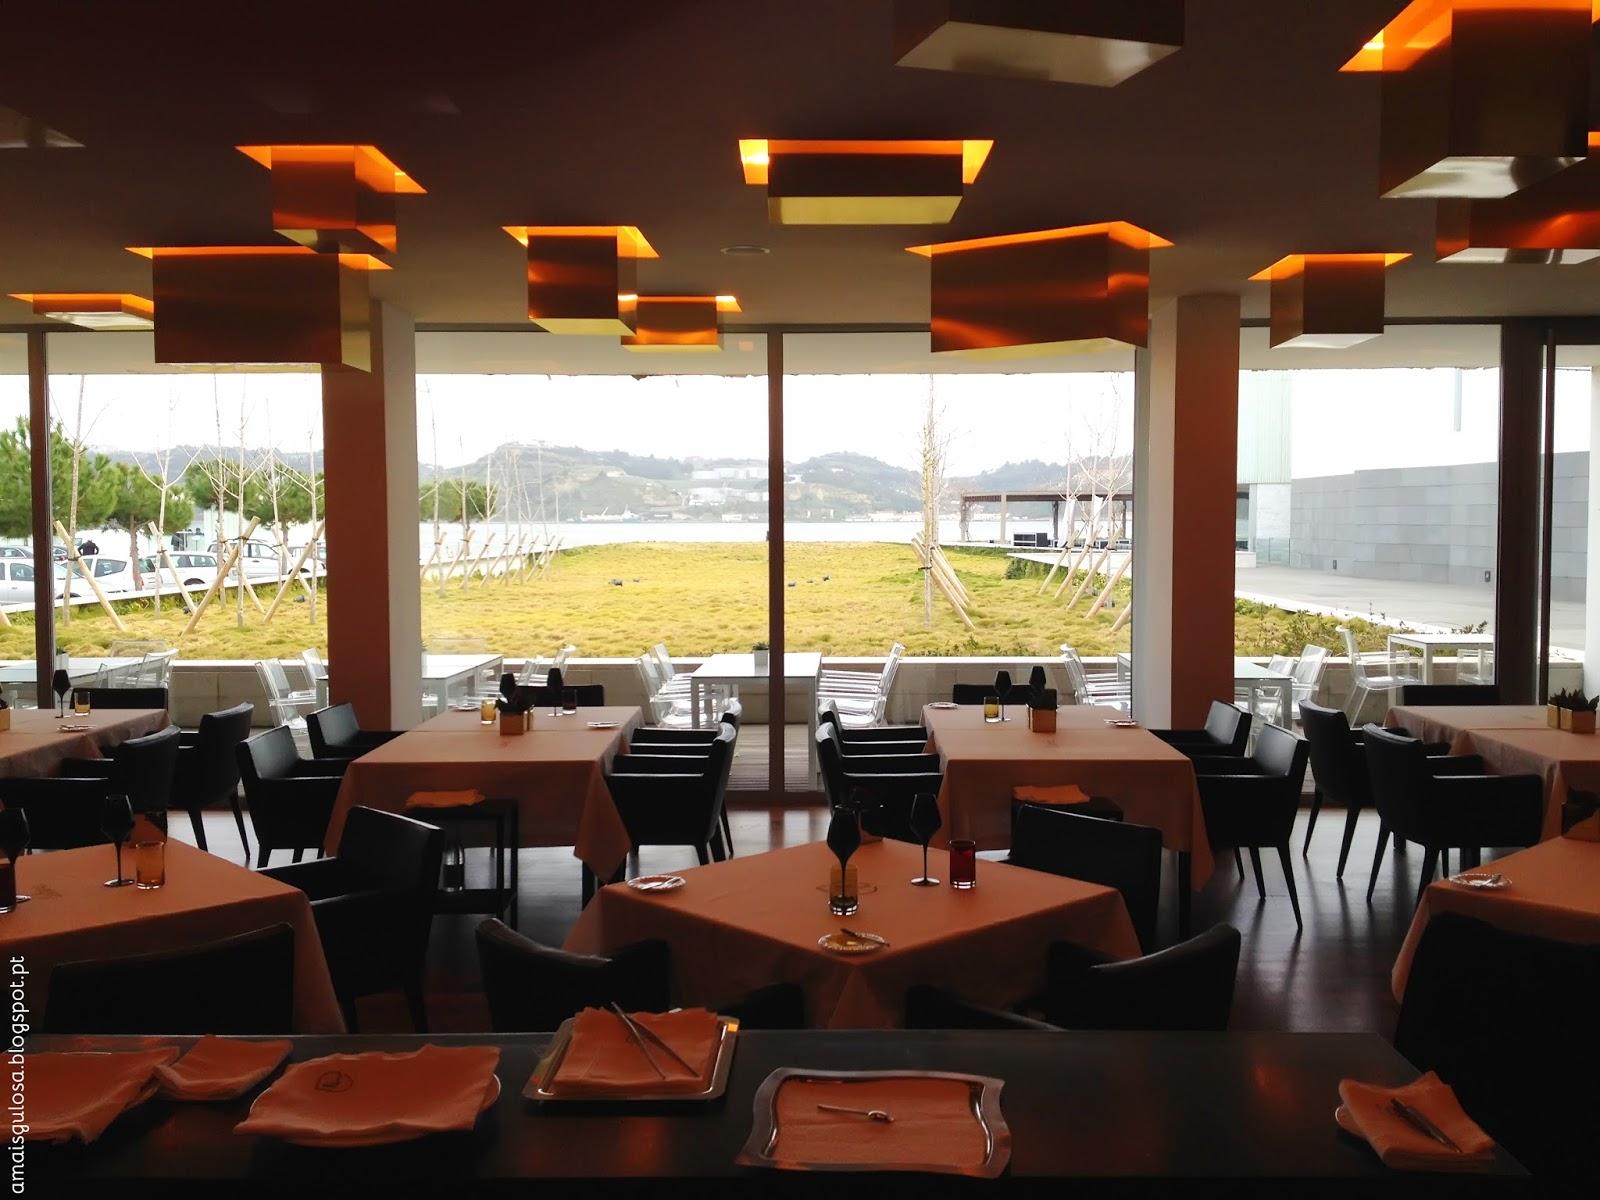 Cafe Rio Awards Airport